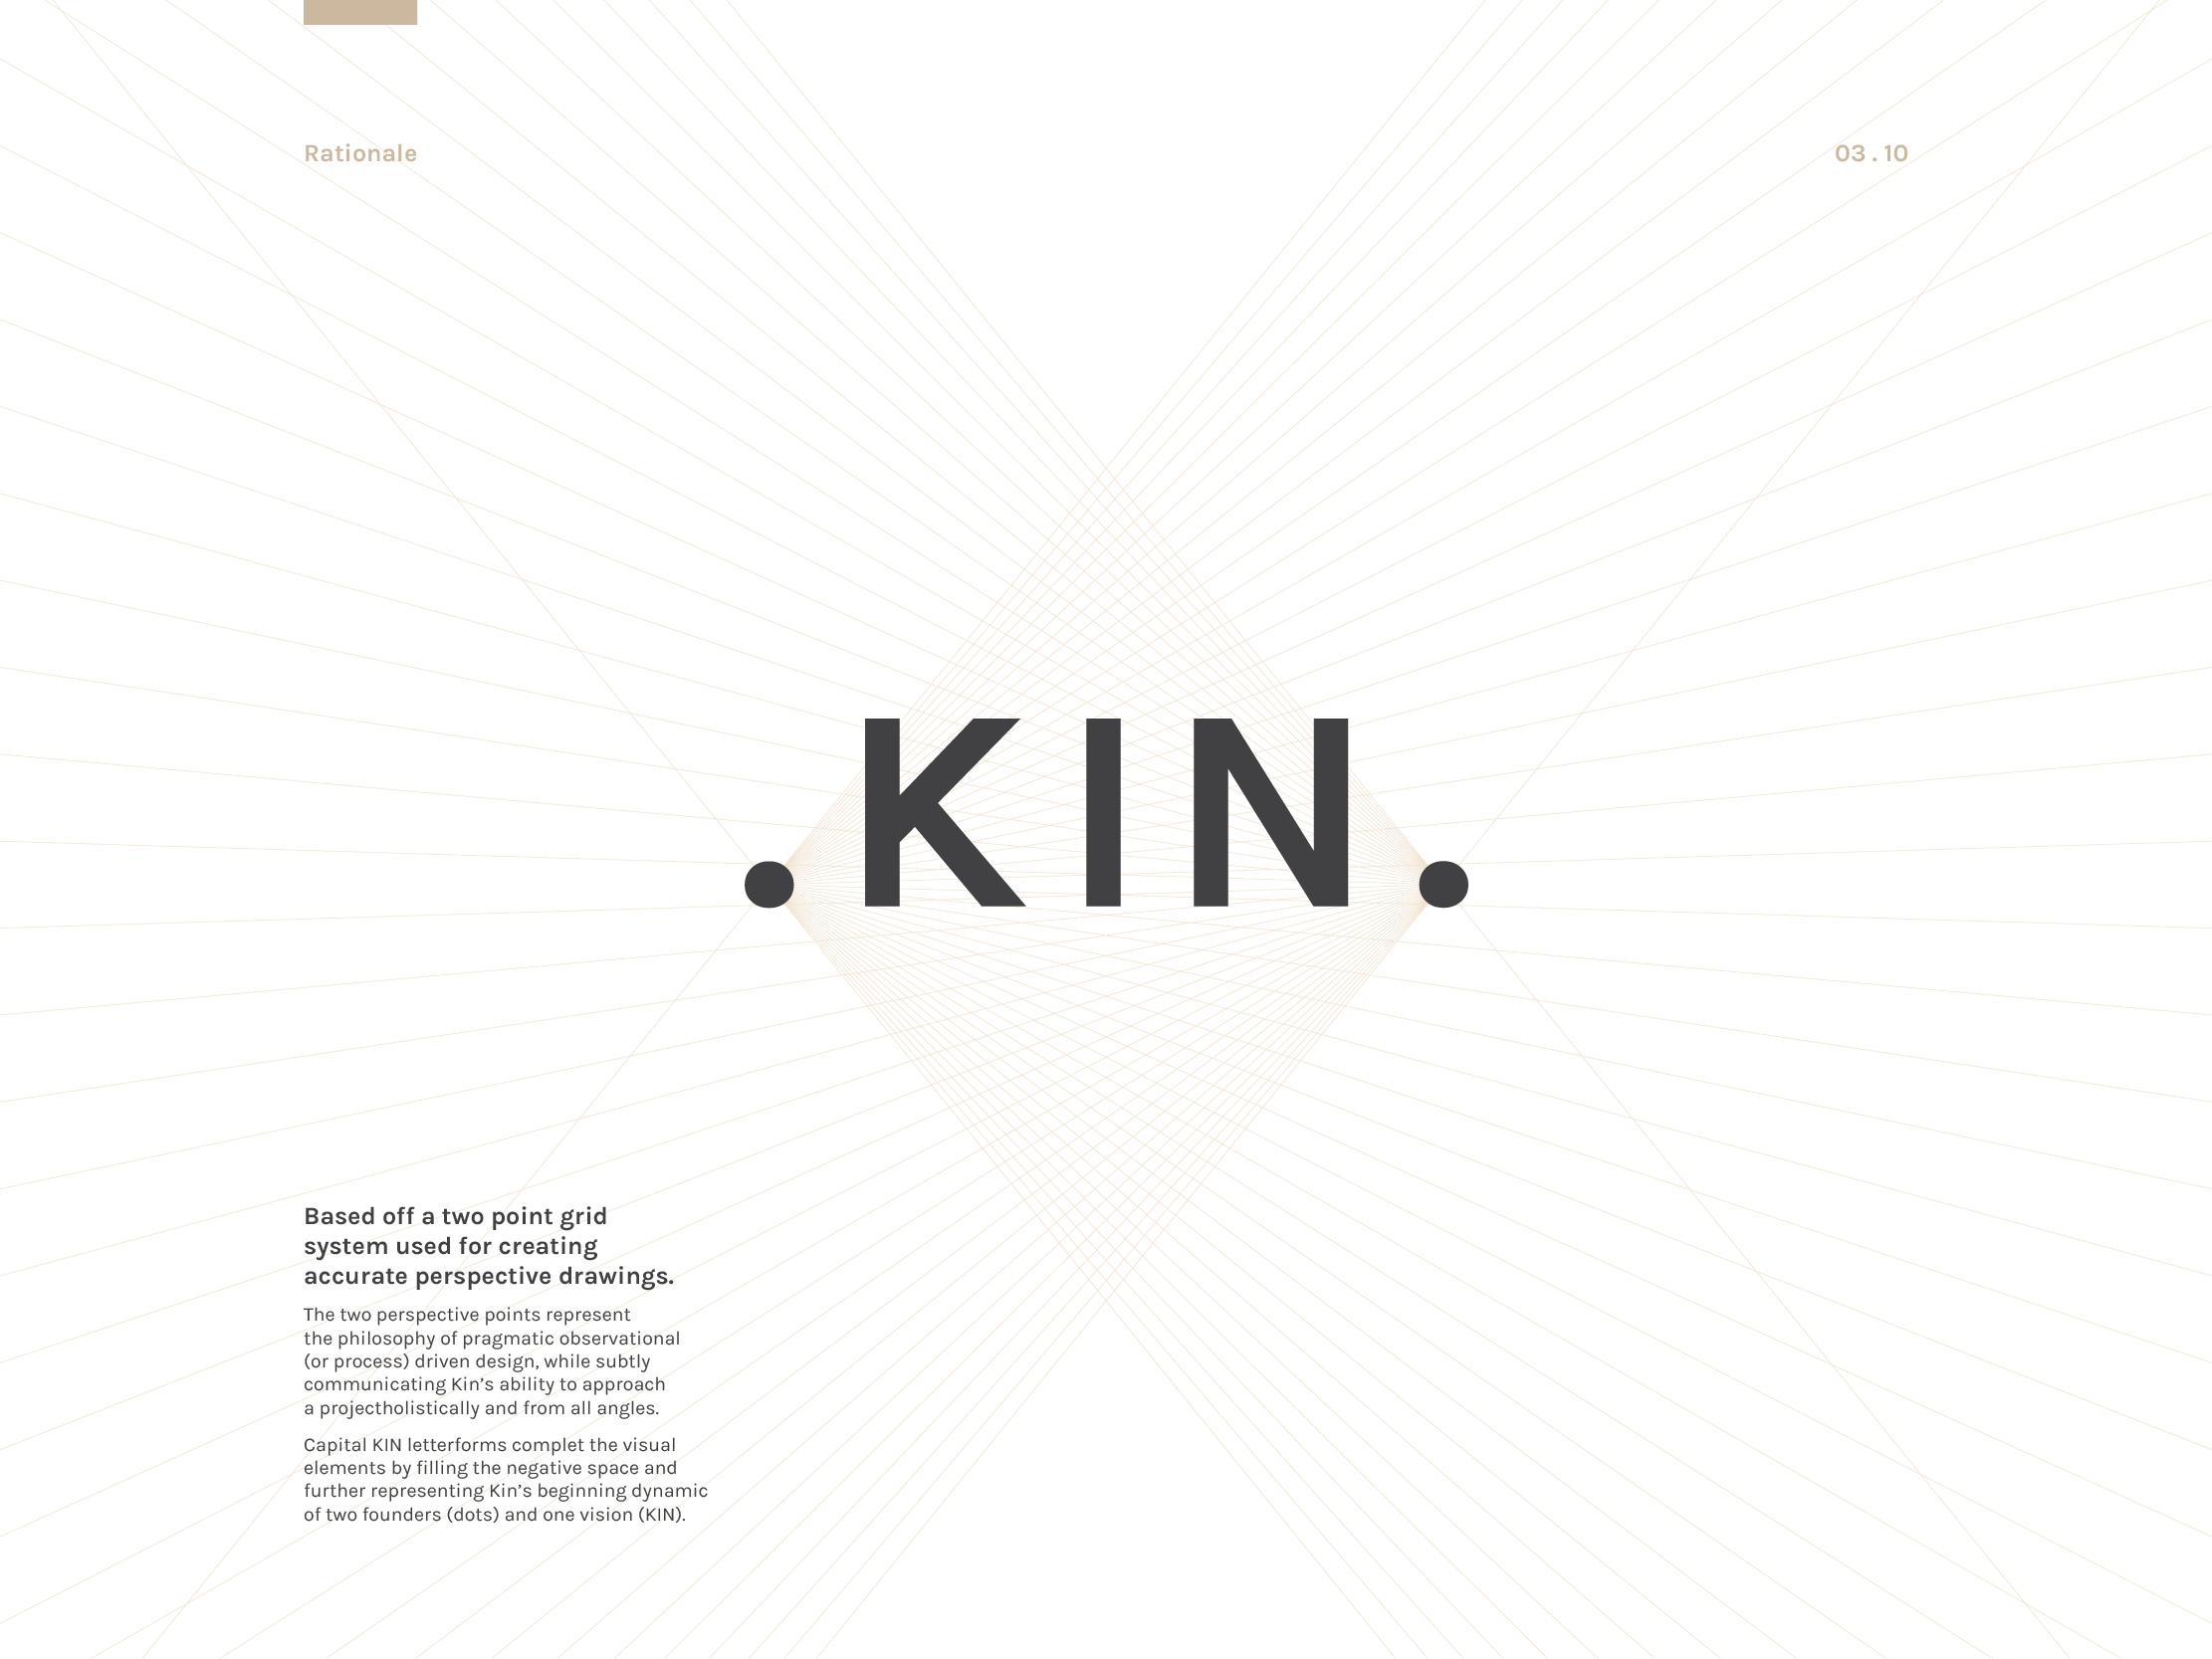 kinarchitects-project-web3.jpg